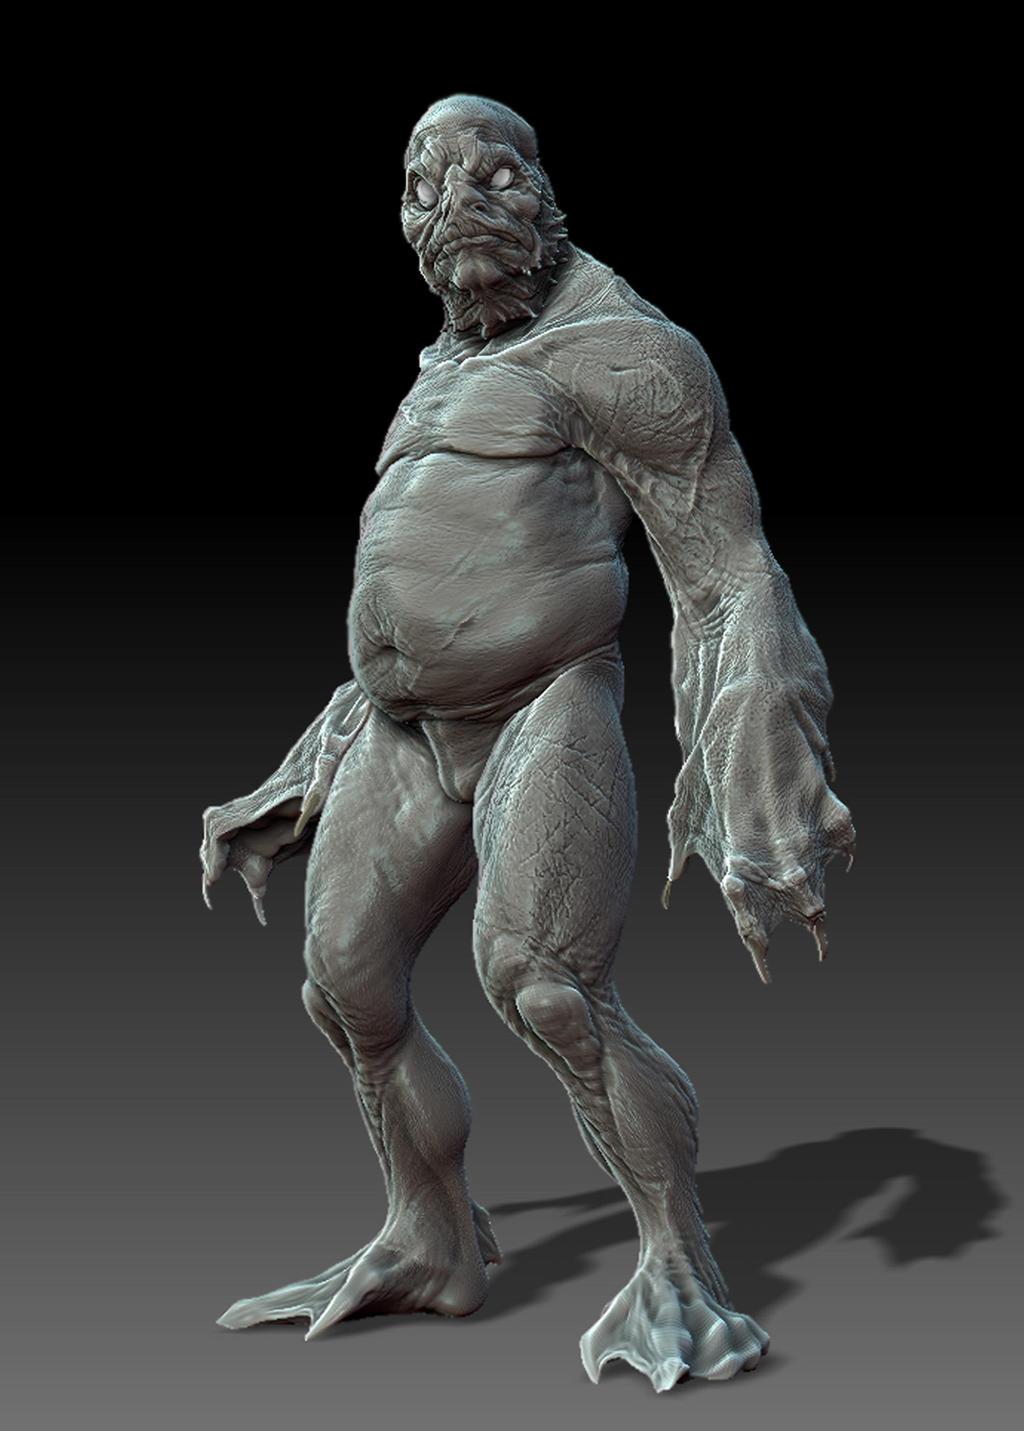 Innsmouth Brute, by DaveGrasso